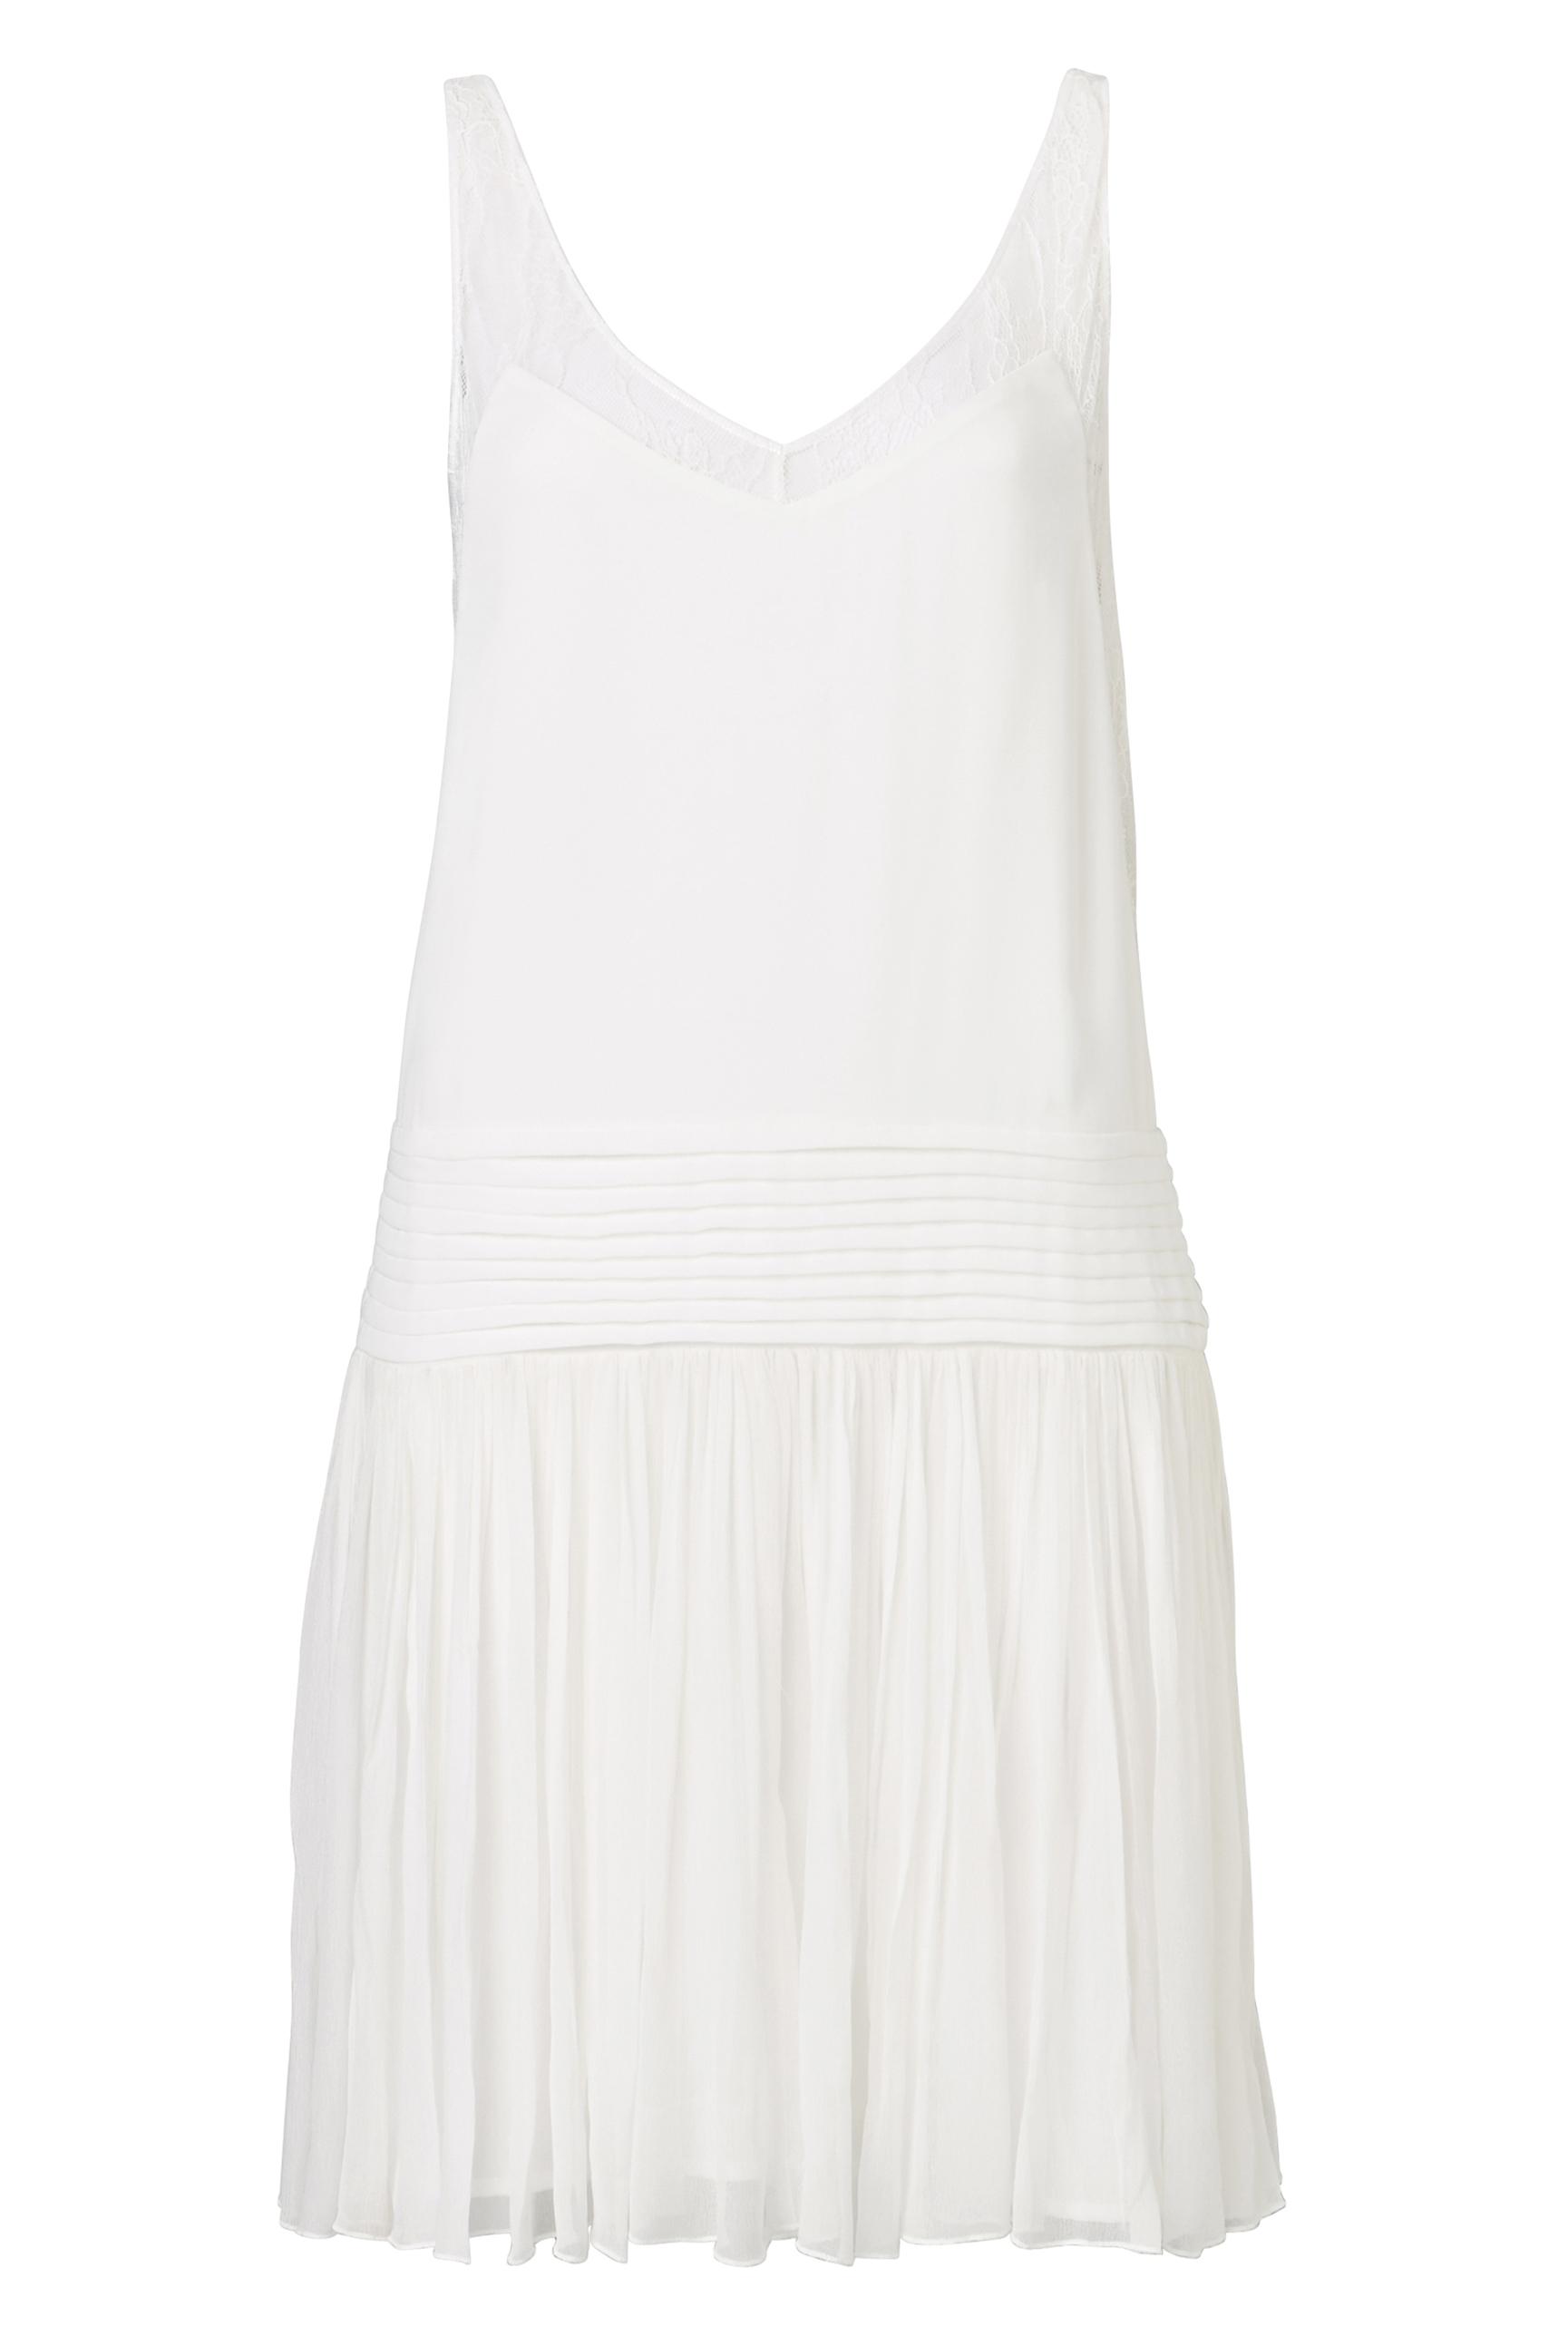 60196810_Witchery Femme Dress, RRP $199.90